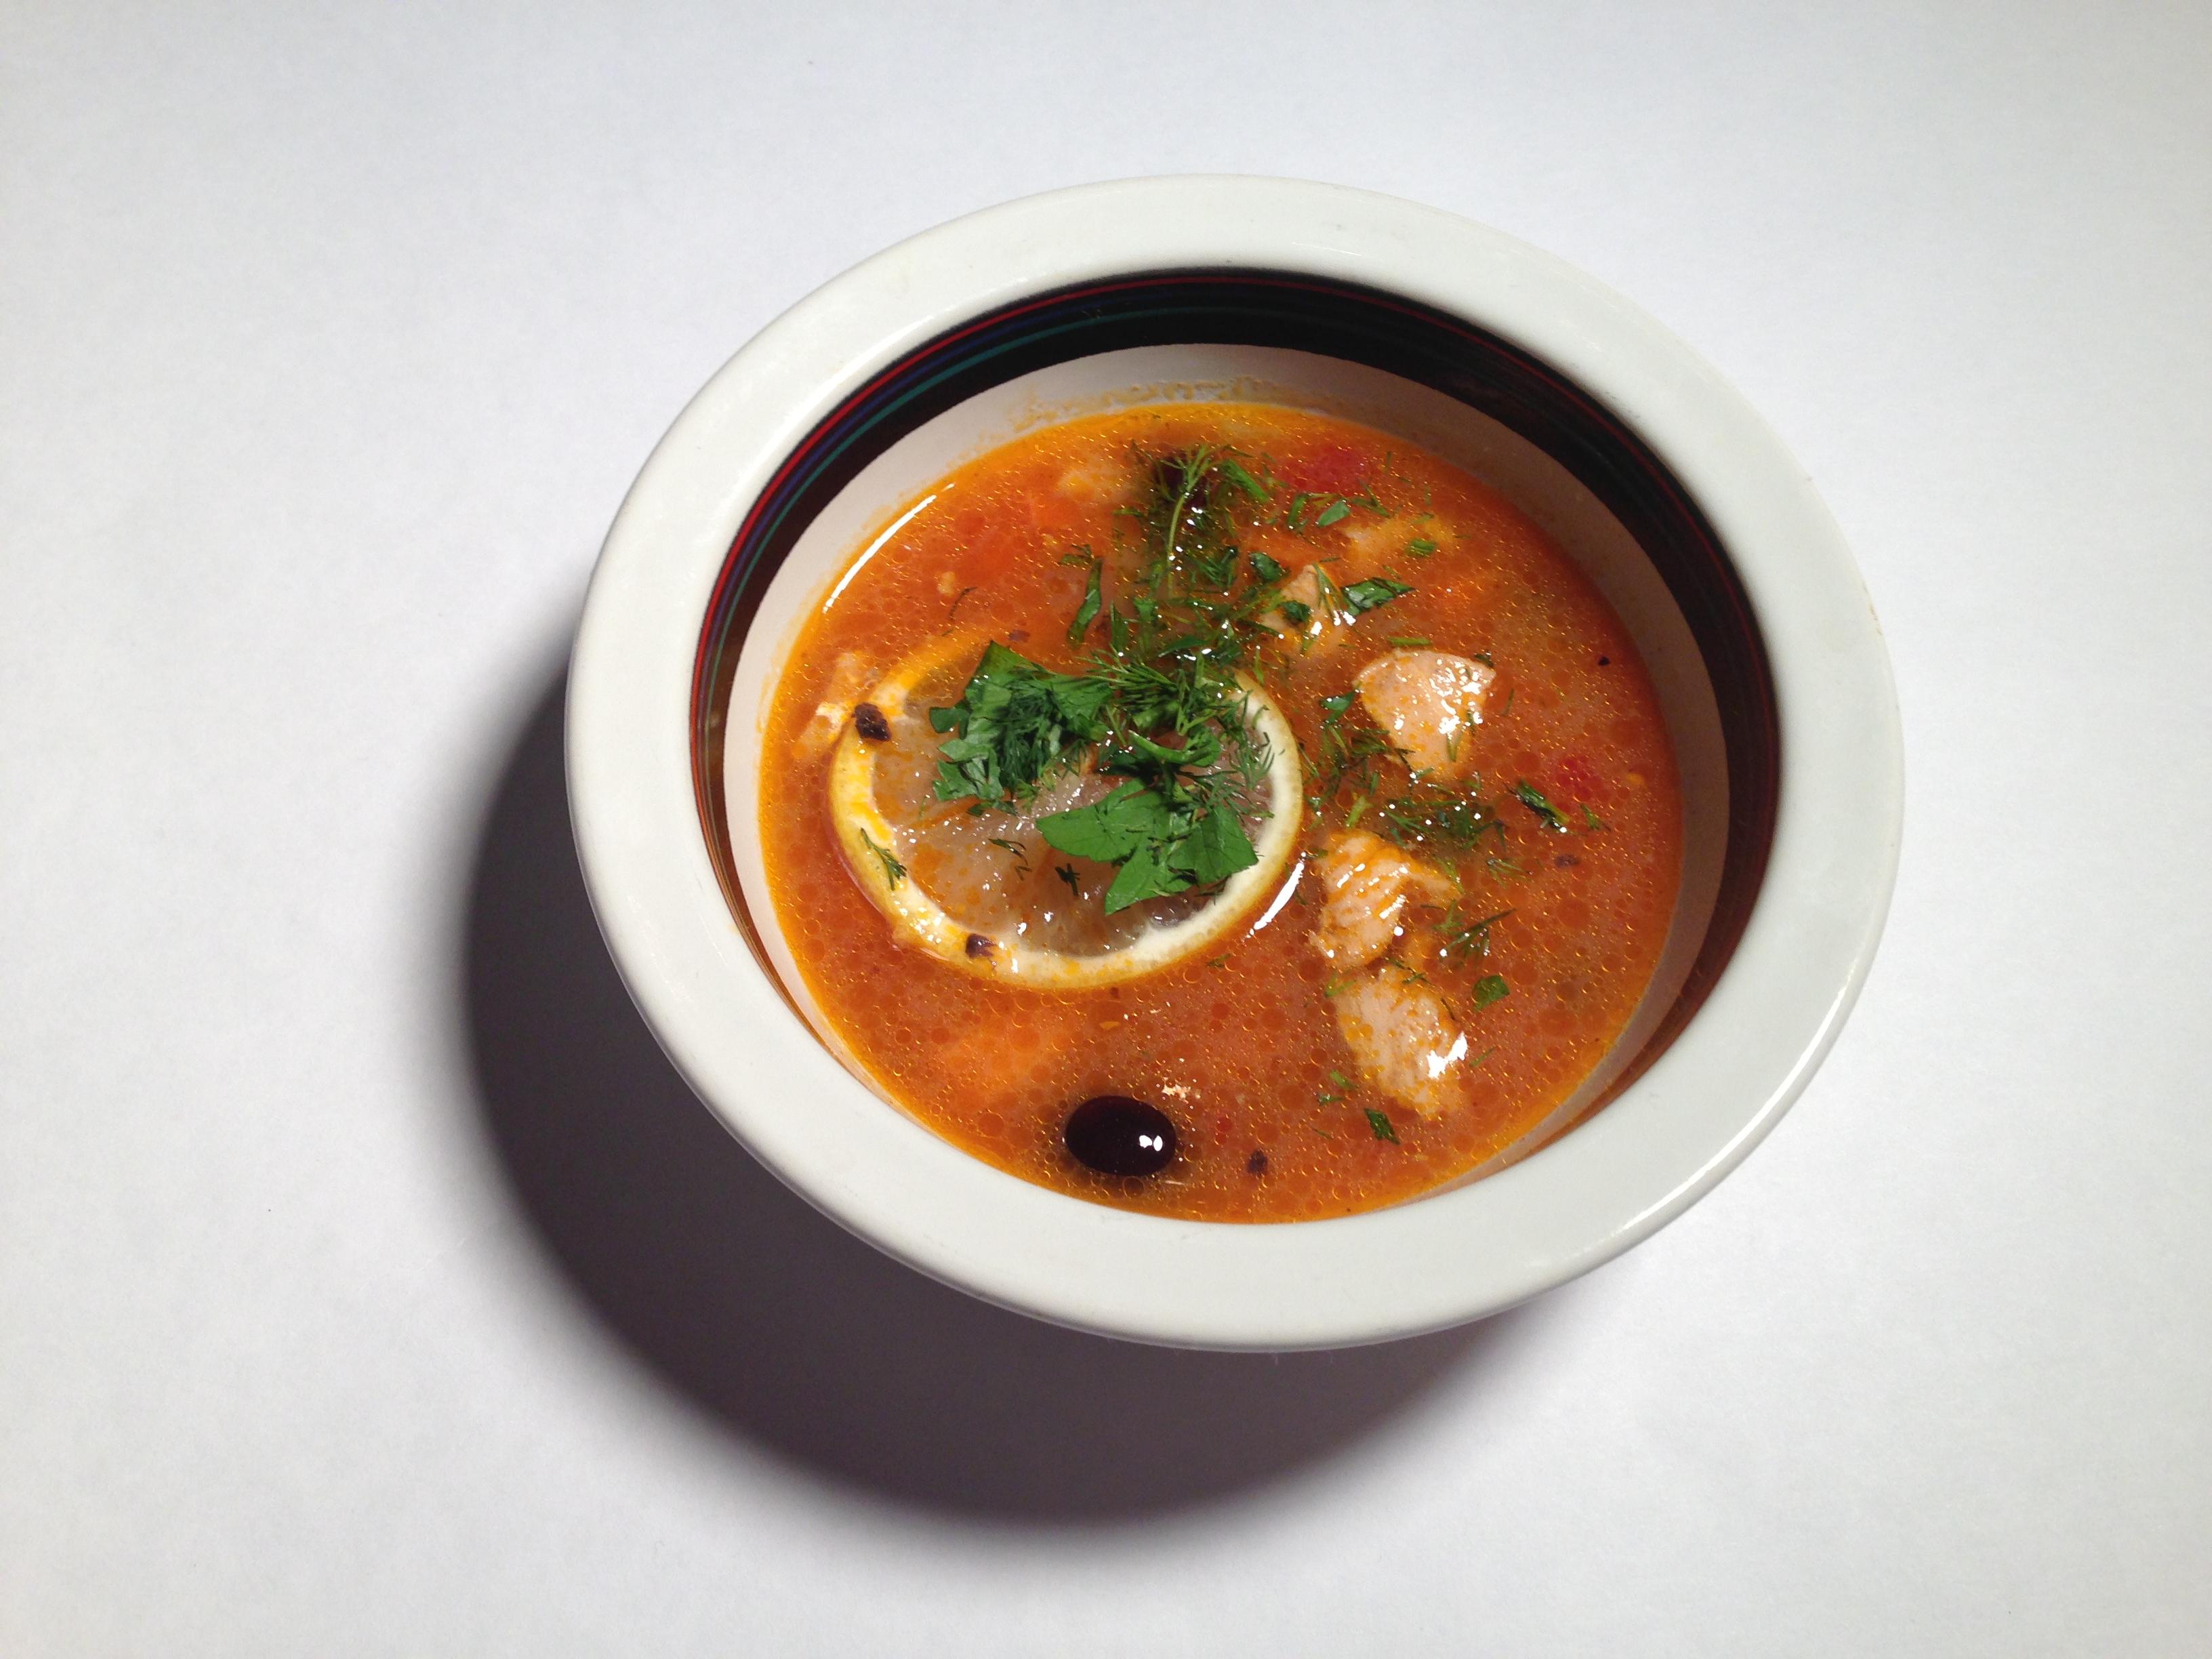 https://i1.wp.com/soupandbread.net/wp-content/uploads/KODESKI-fish-stew2.jpg